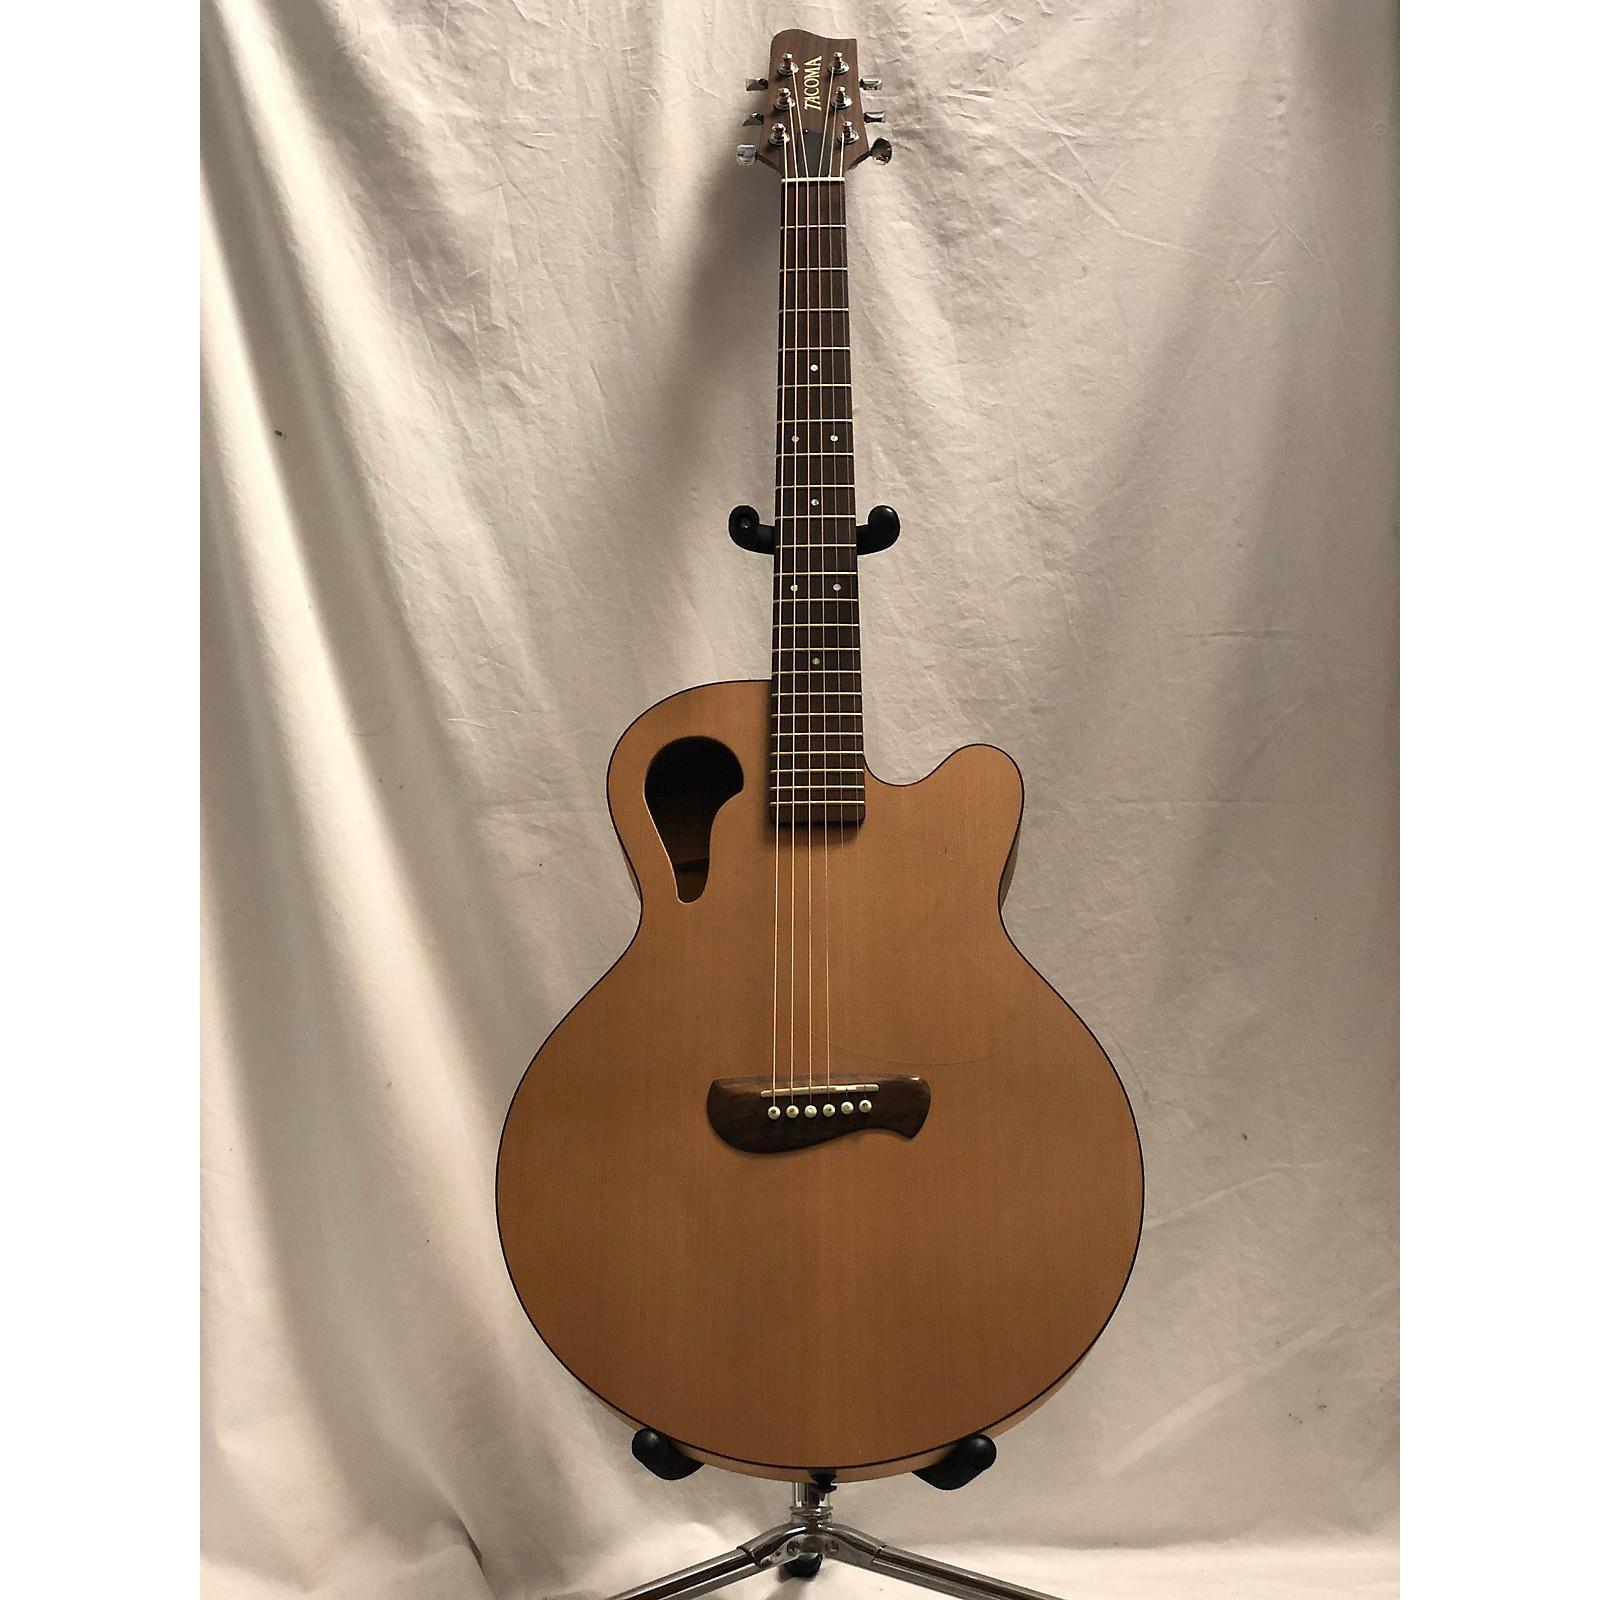 Tacoma Chief Acoustic Guitar